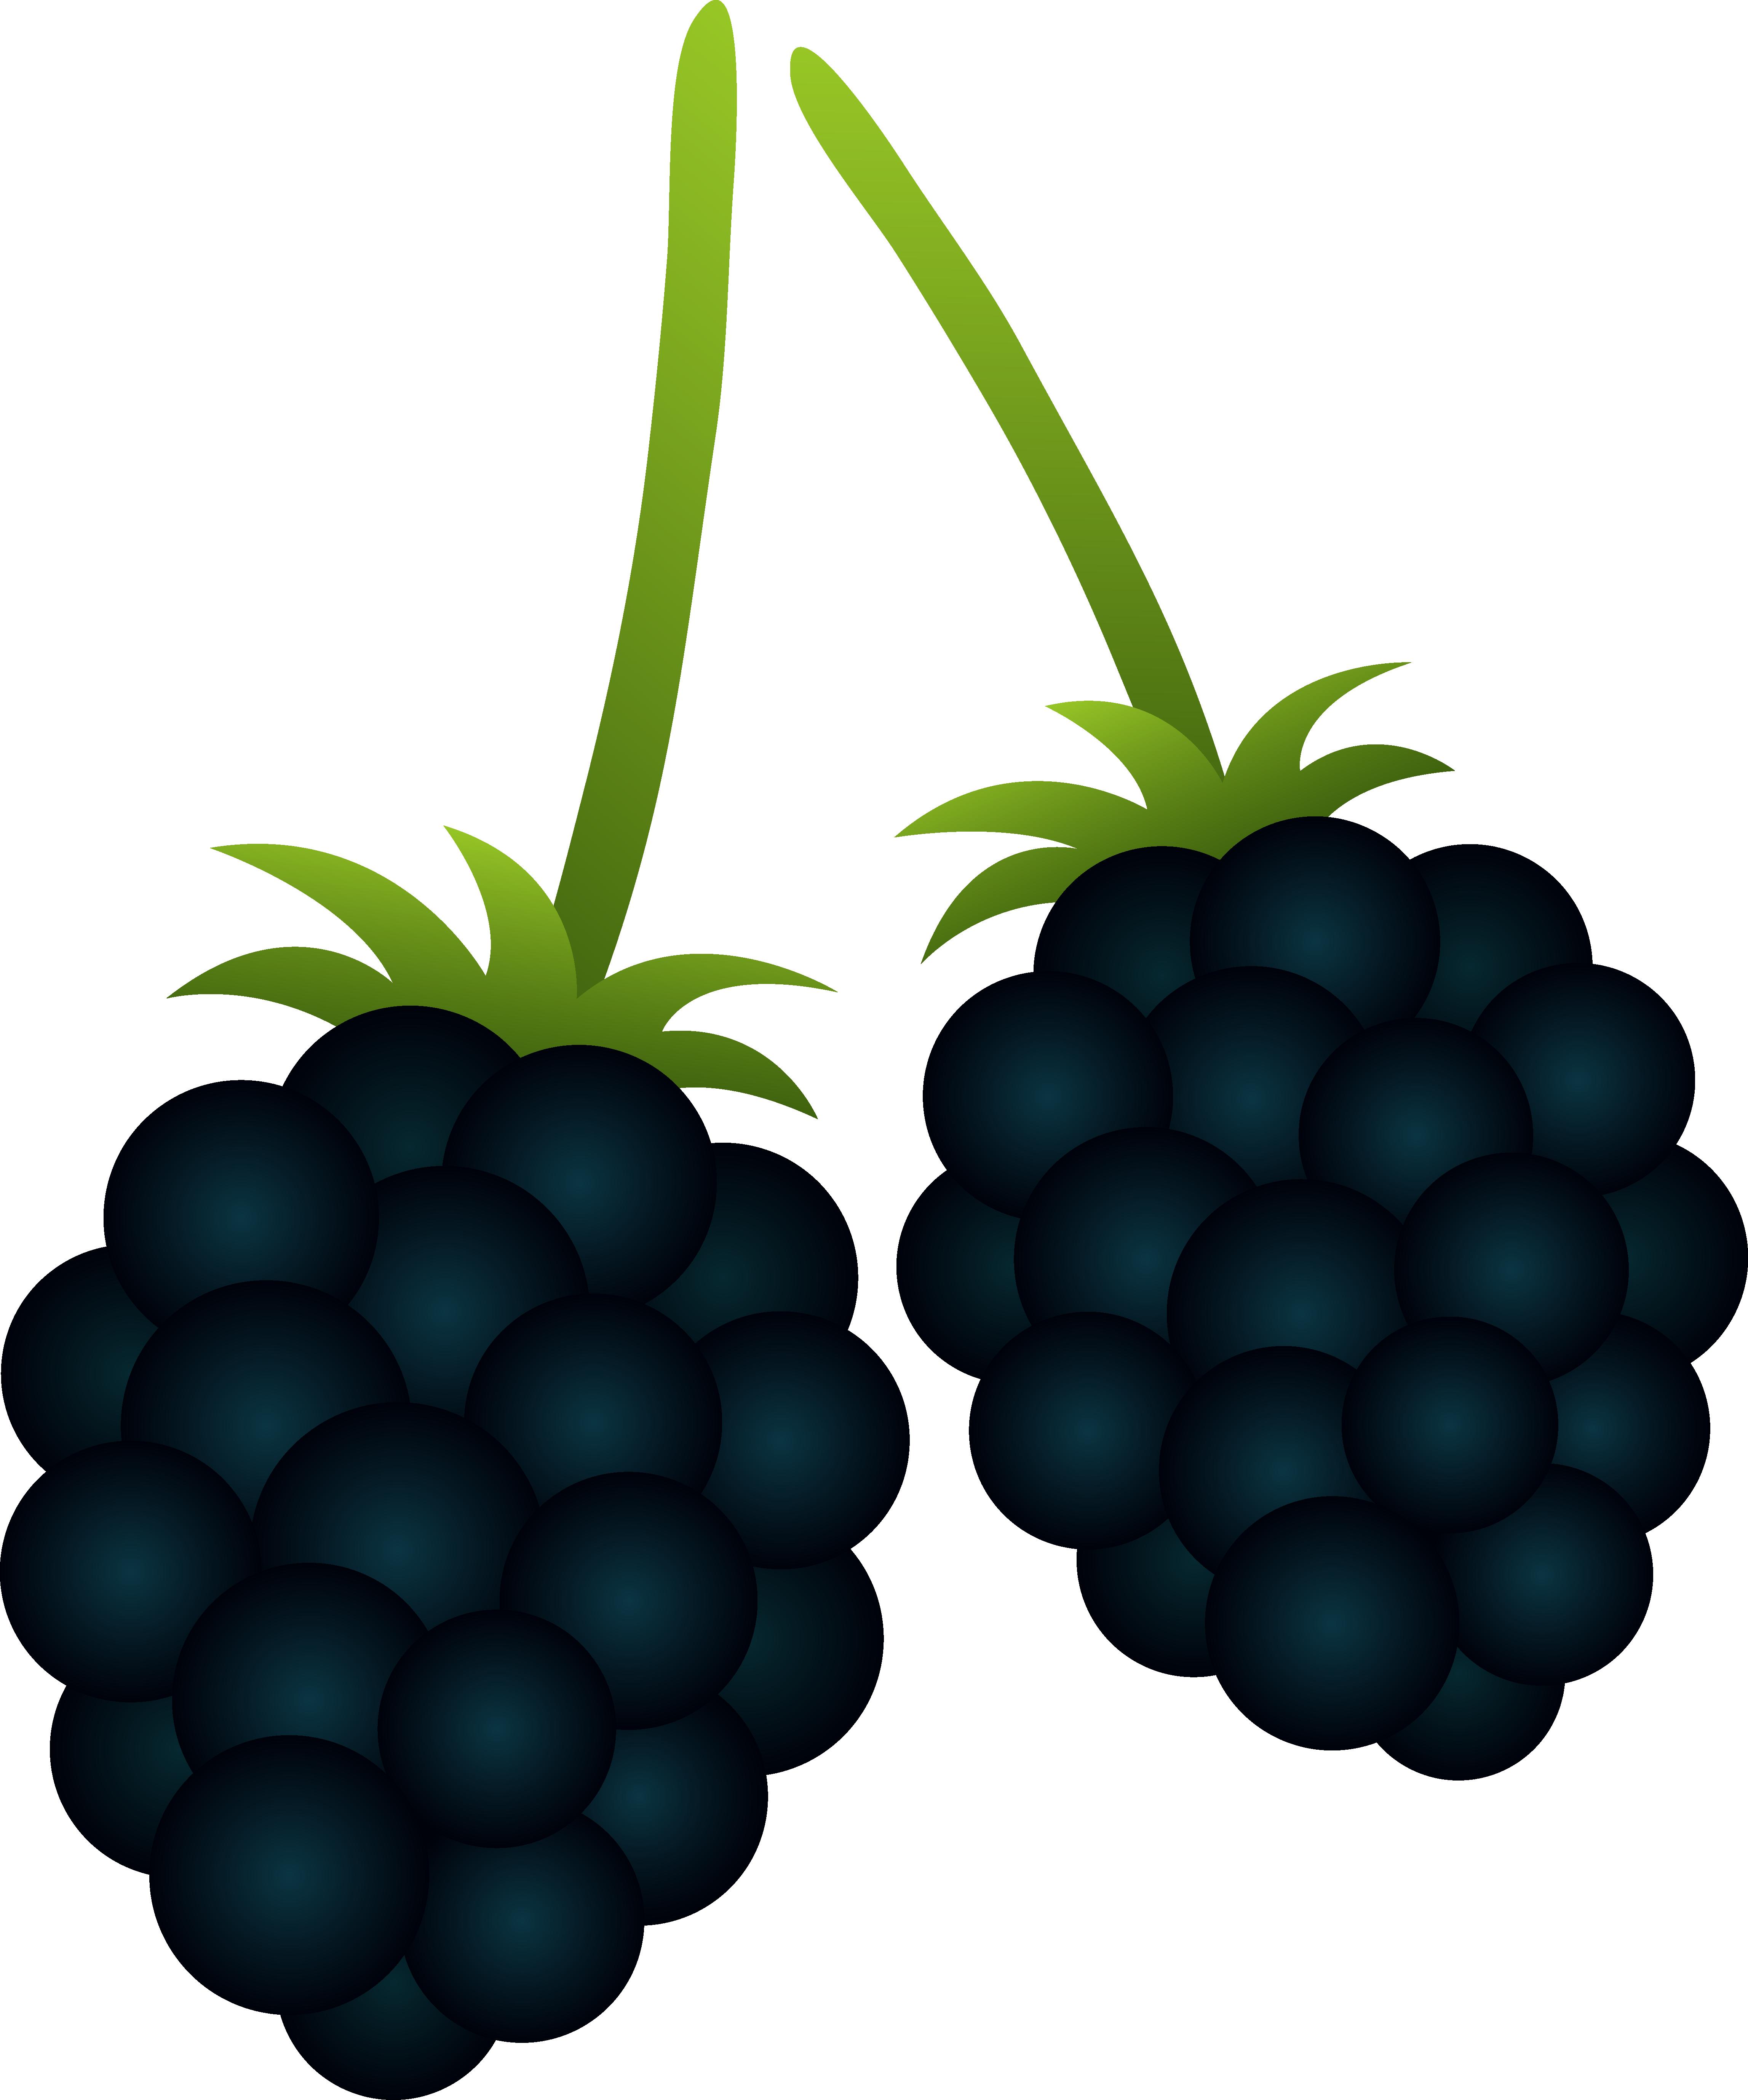 Berries clipart clip art. Marvelous berry two blackberries